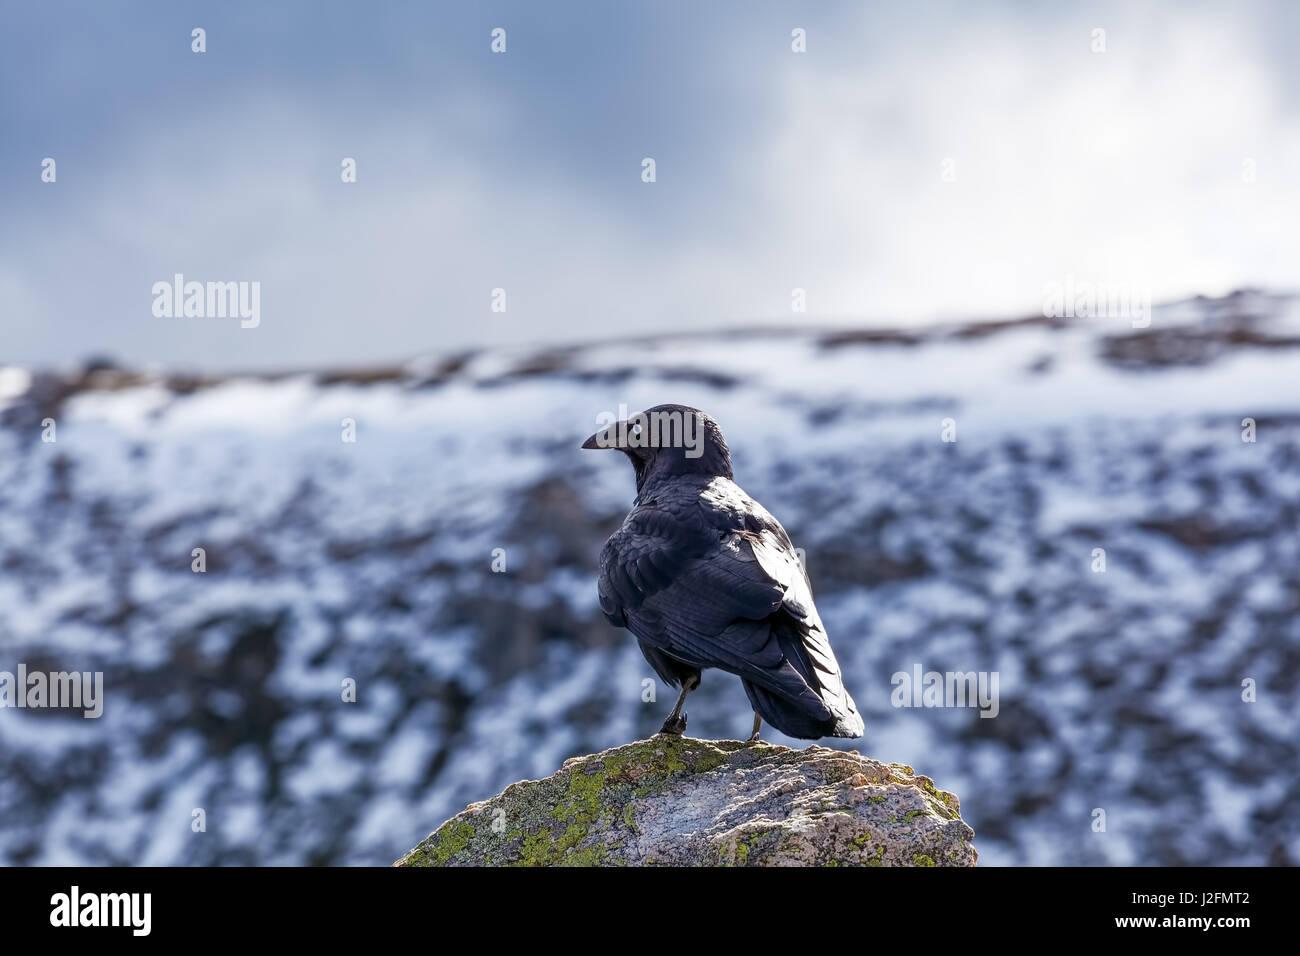 Portrait of Australian Raven gazing at snowy mountains - Stock Image